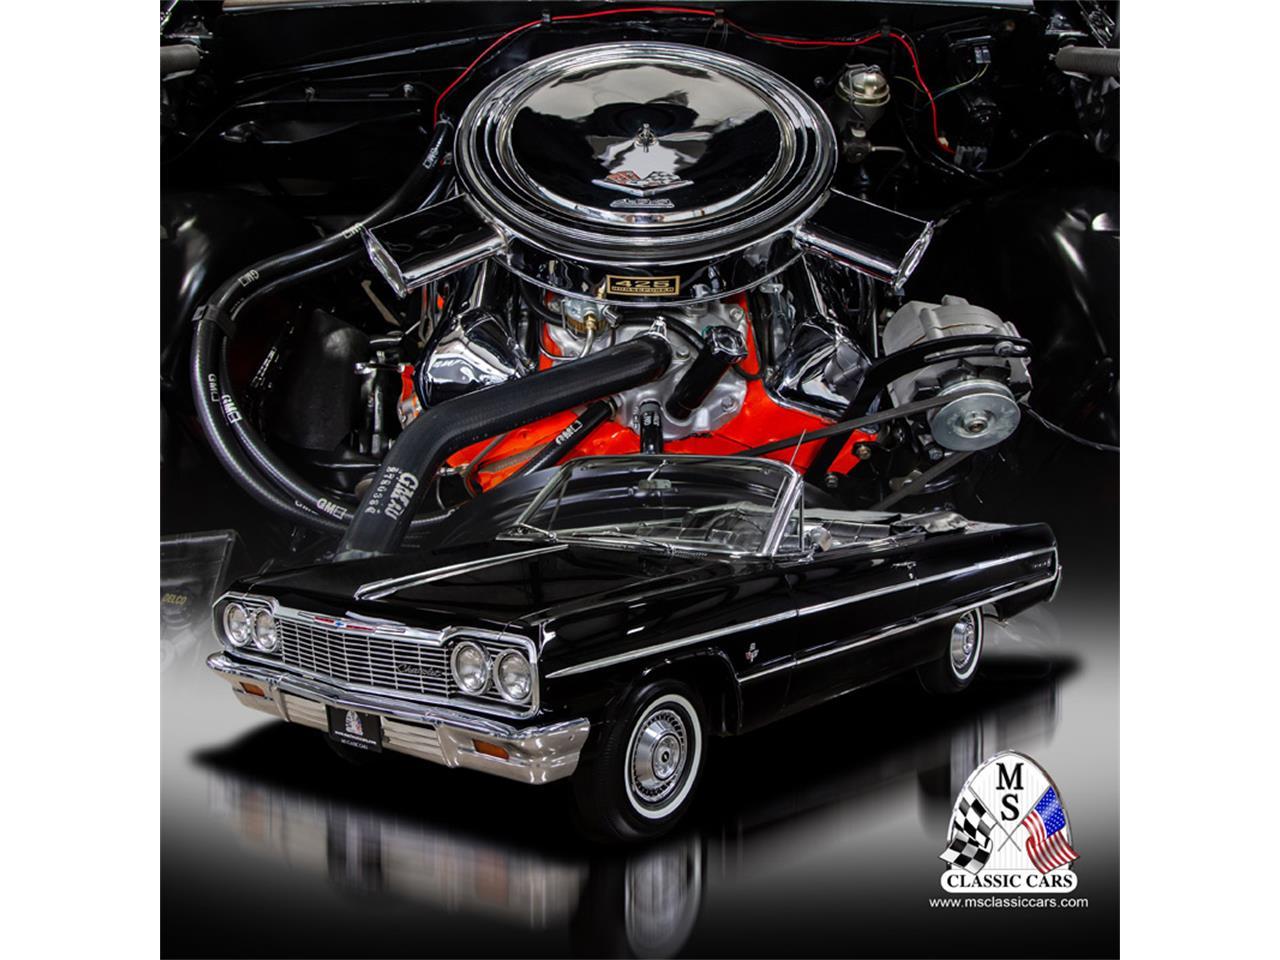 1964 Chevrolet Impala (CC-1413585) for sale in Seekonk, Massachusetts